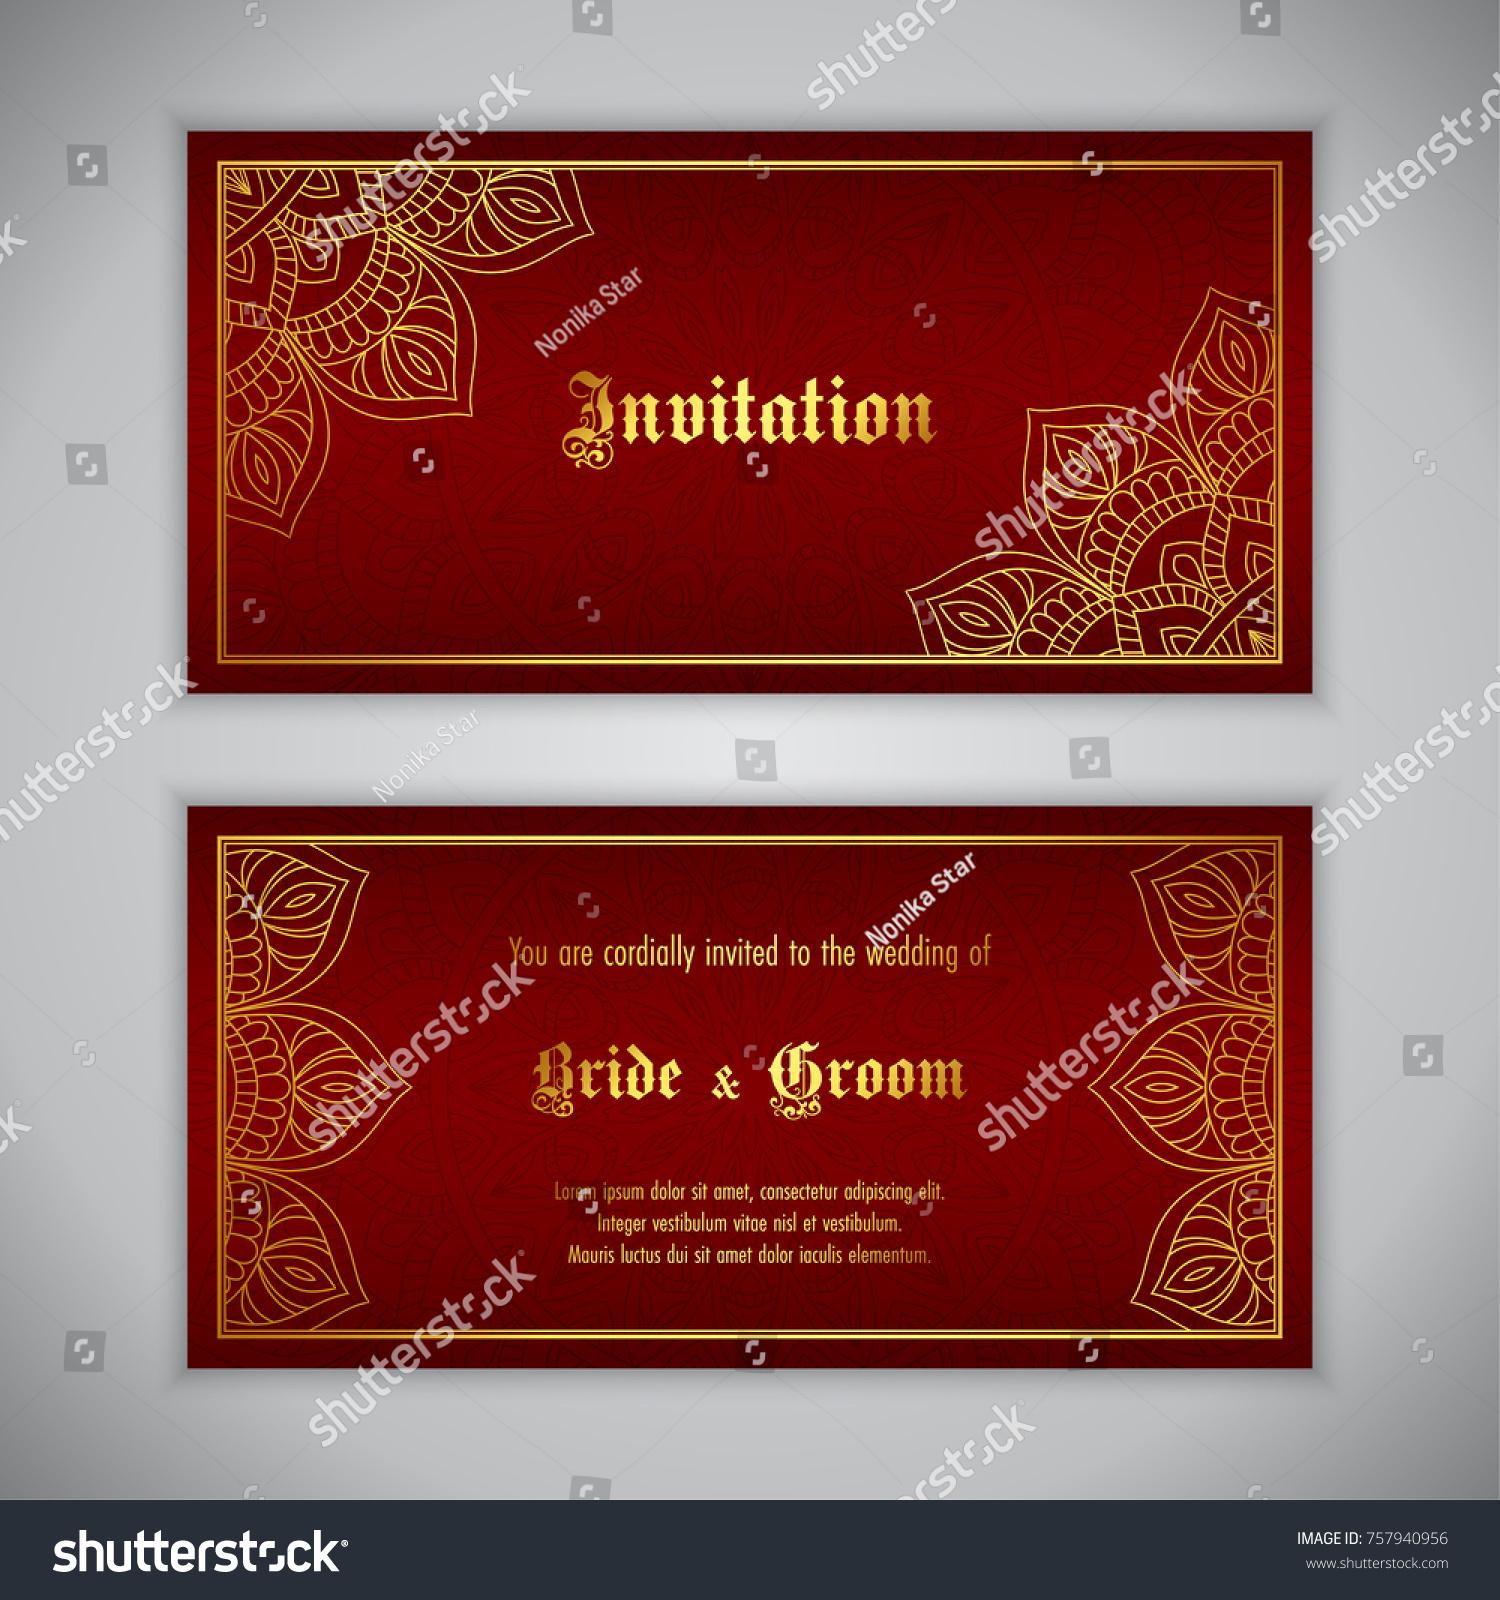 Luxury Wedding Invitation Golden Ornament Vector Stock Vector ...